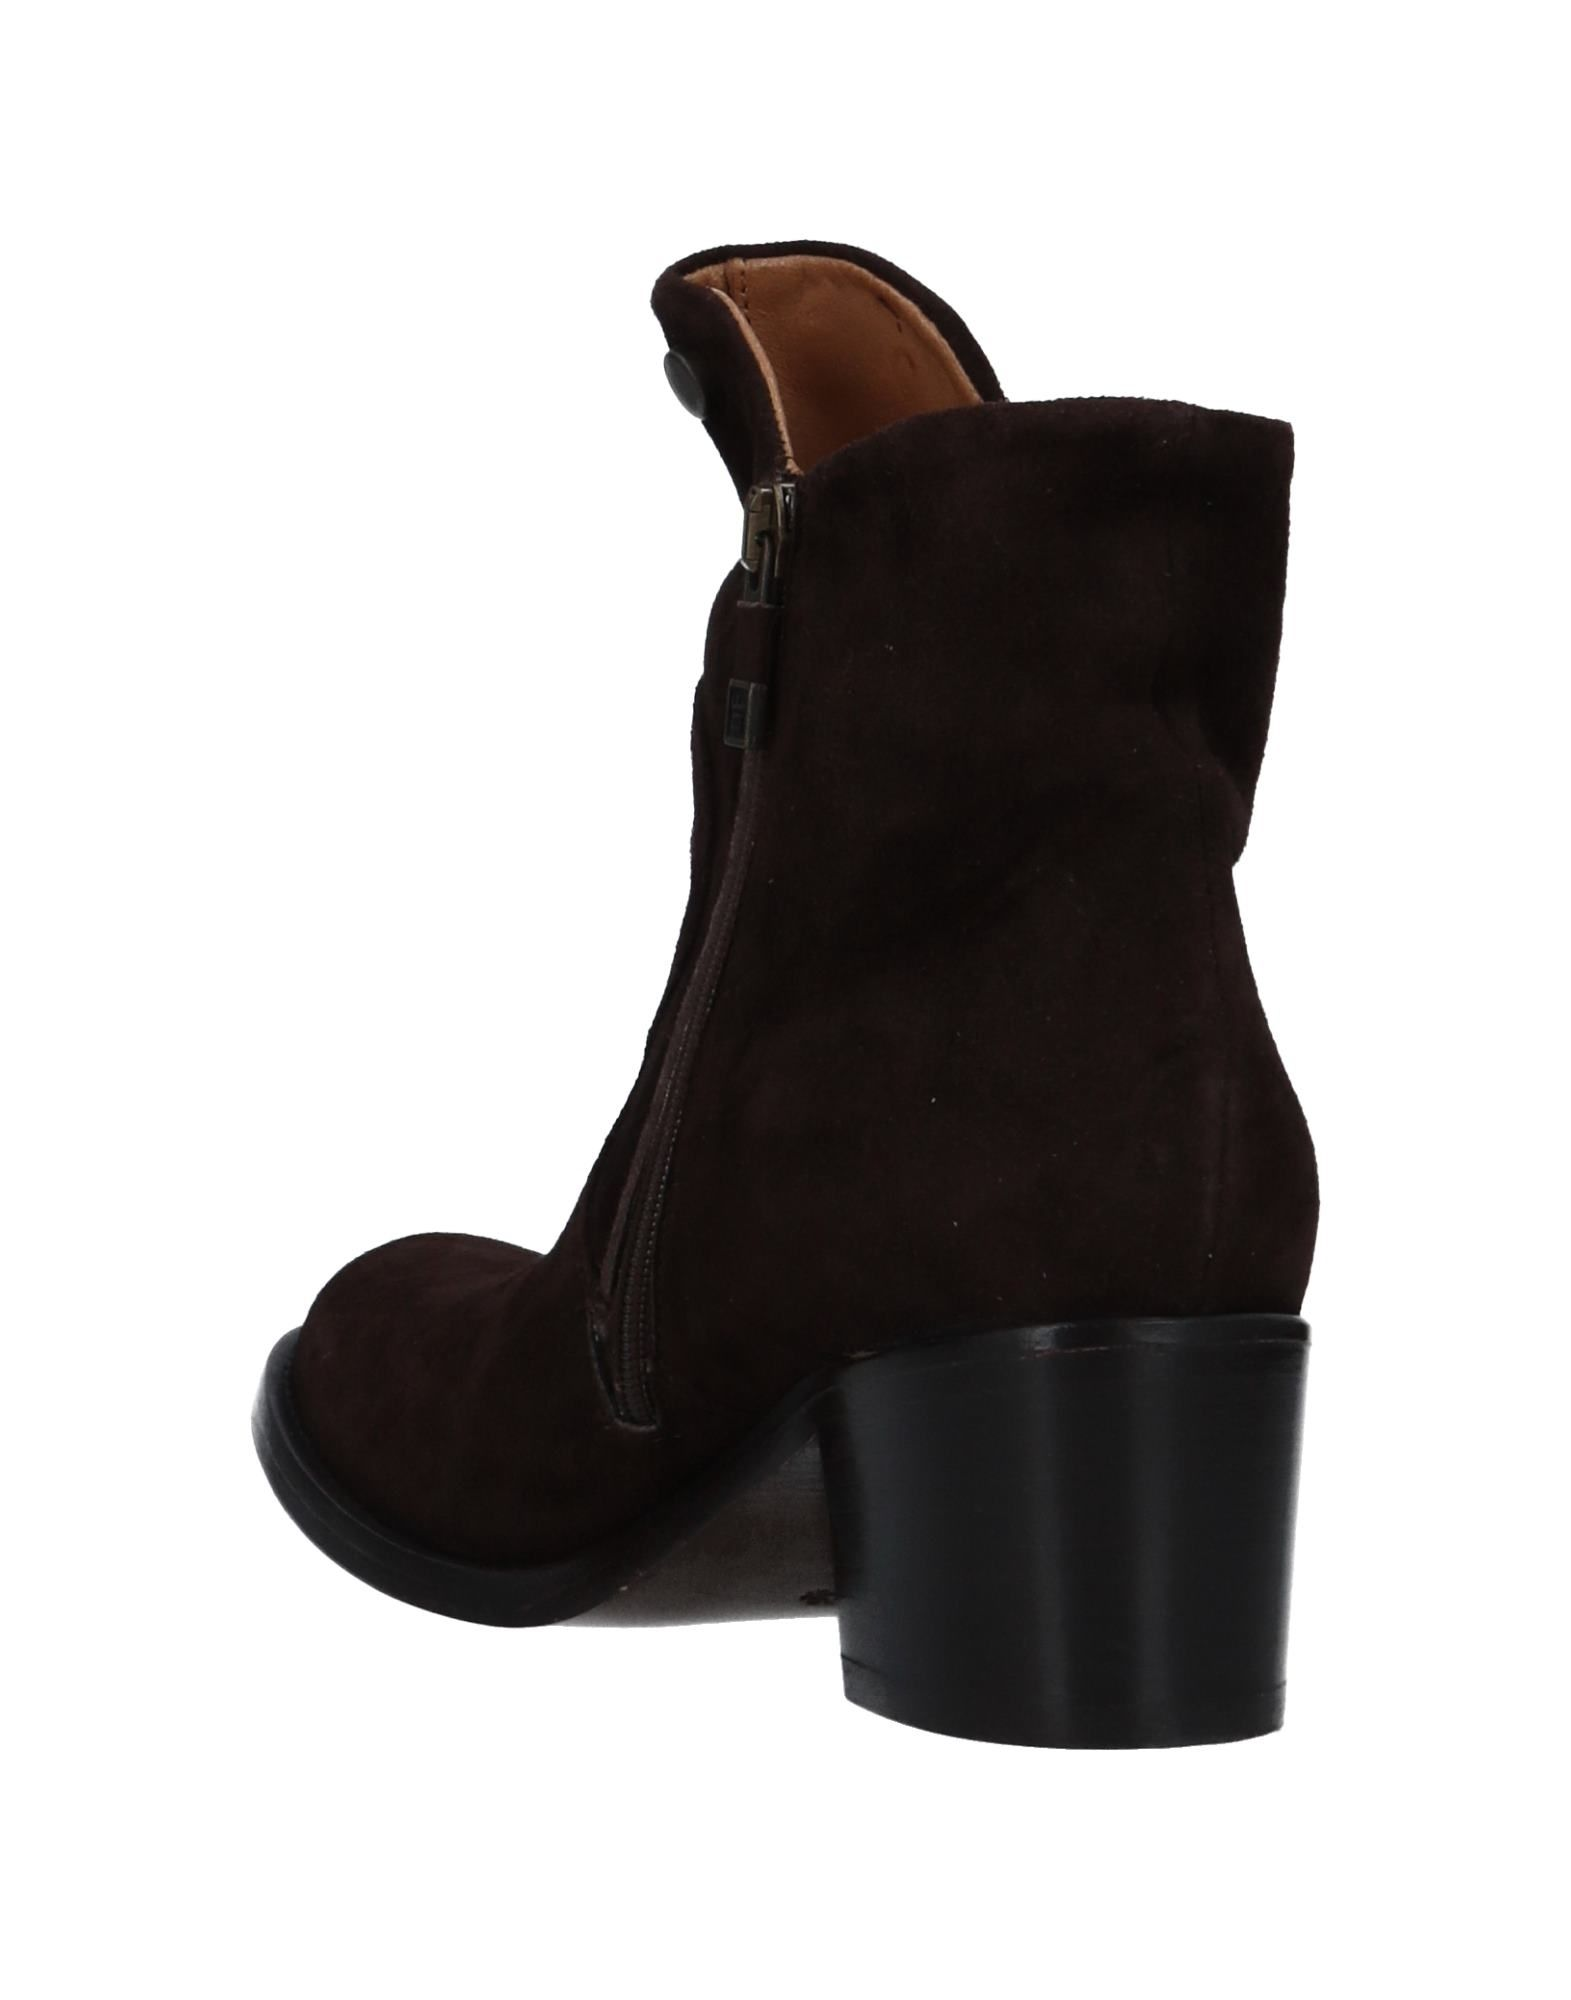 Stilvolle billige Schuhe Schuhe Schuhe Alberto Fermani Stiefelette Damen  11535187KX 0132ea